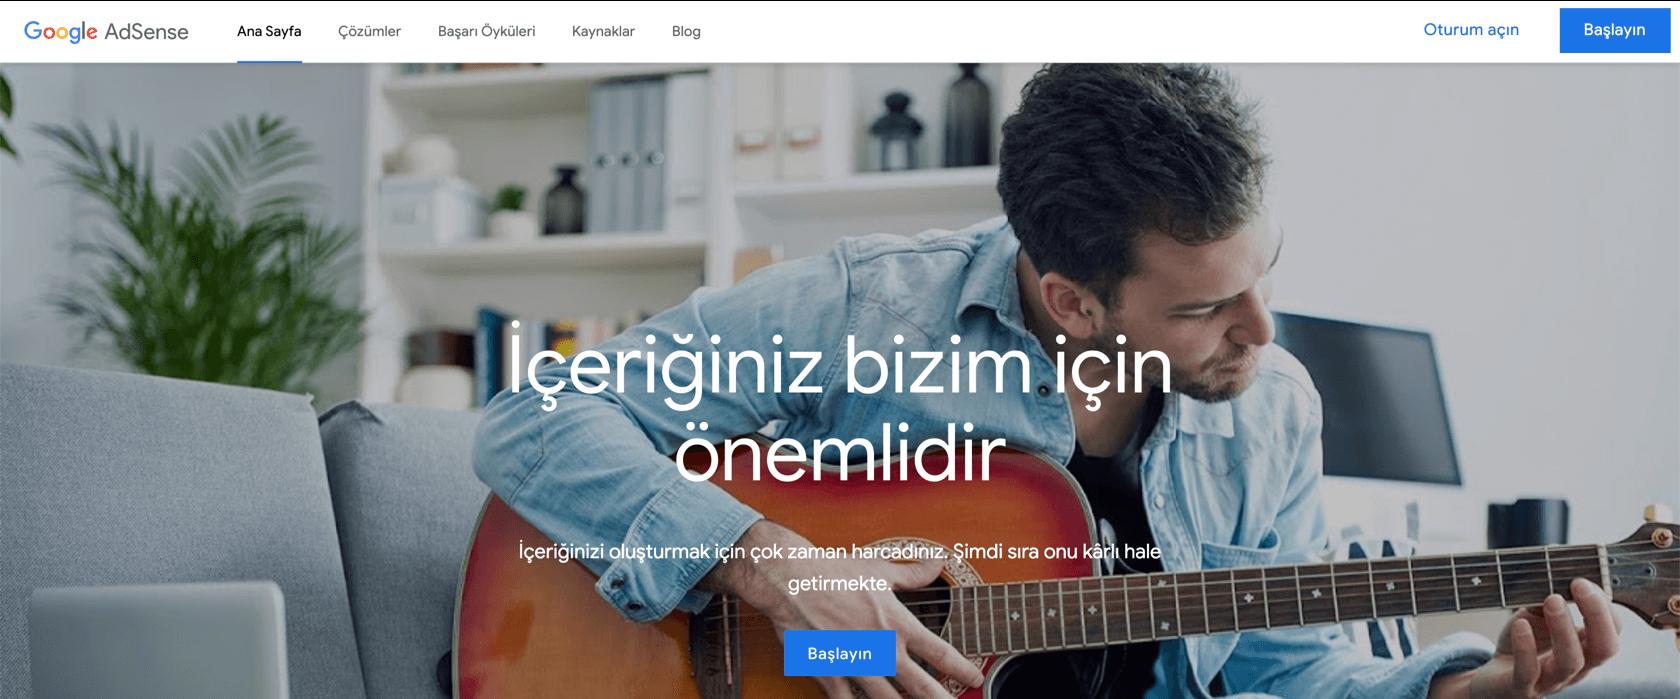 Google Adsense ile internetten para kazanma